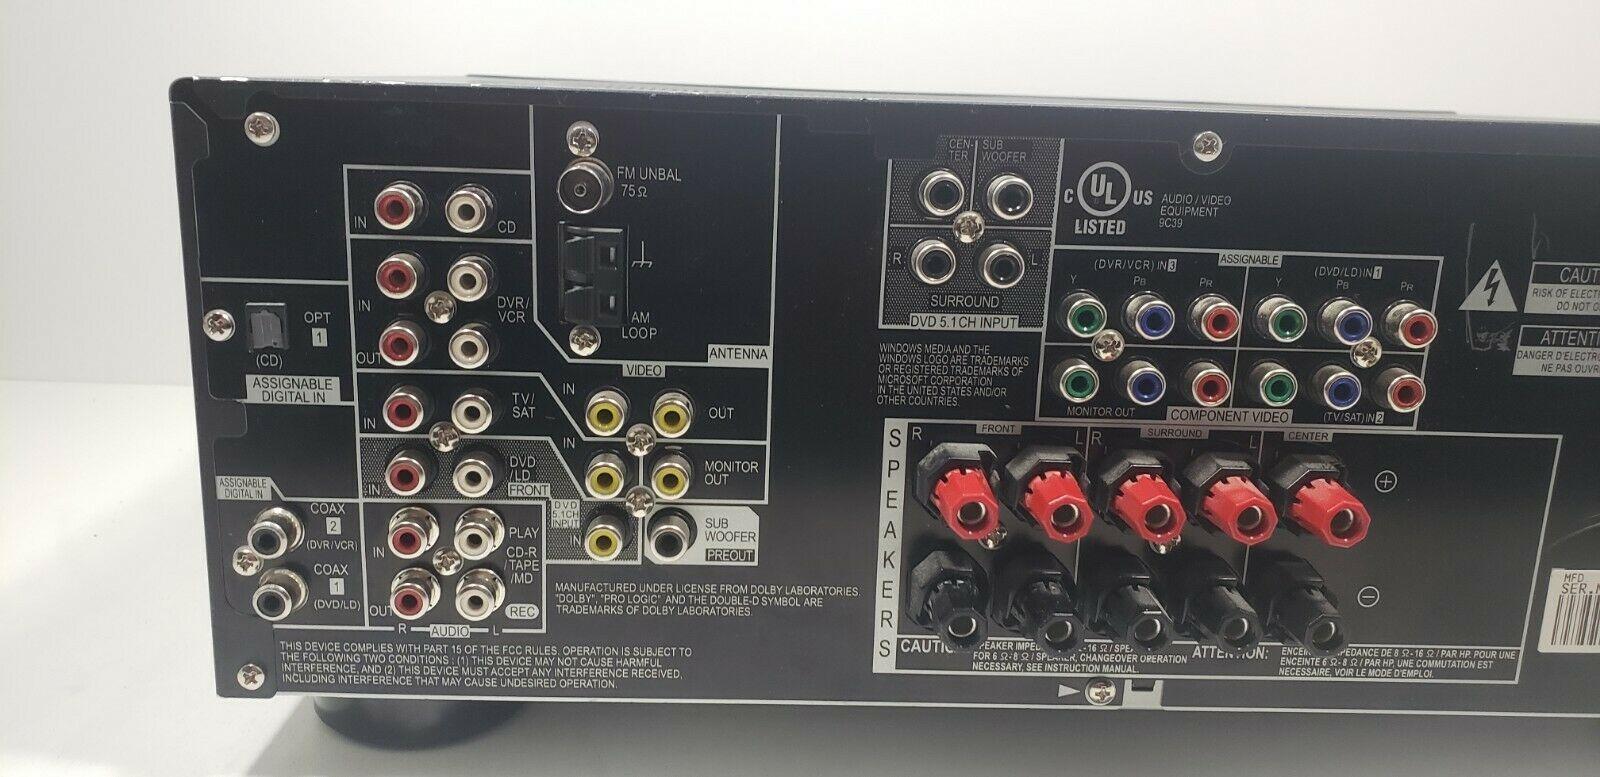 Pioneer Audio Video Multi-Channel Receiver VSX-517-K/Remote bundle  Tested